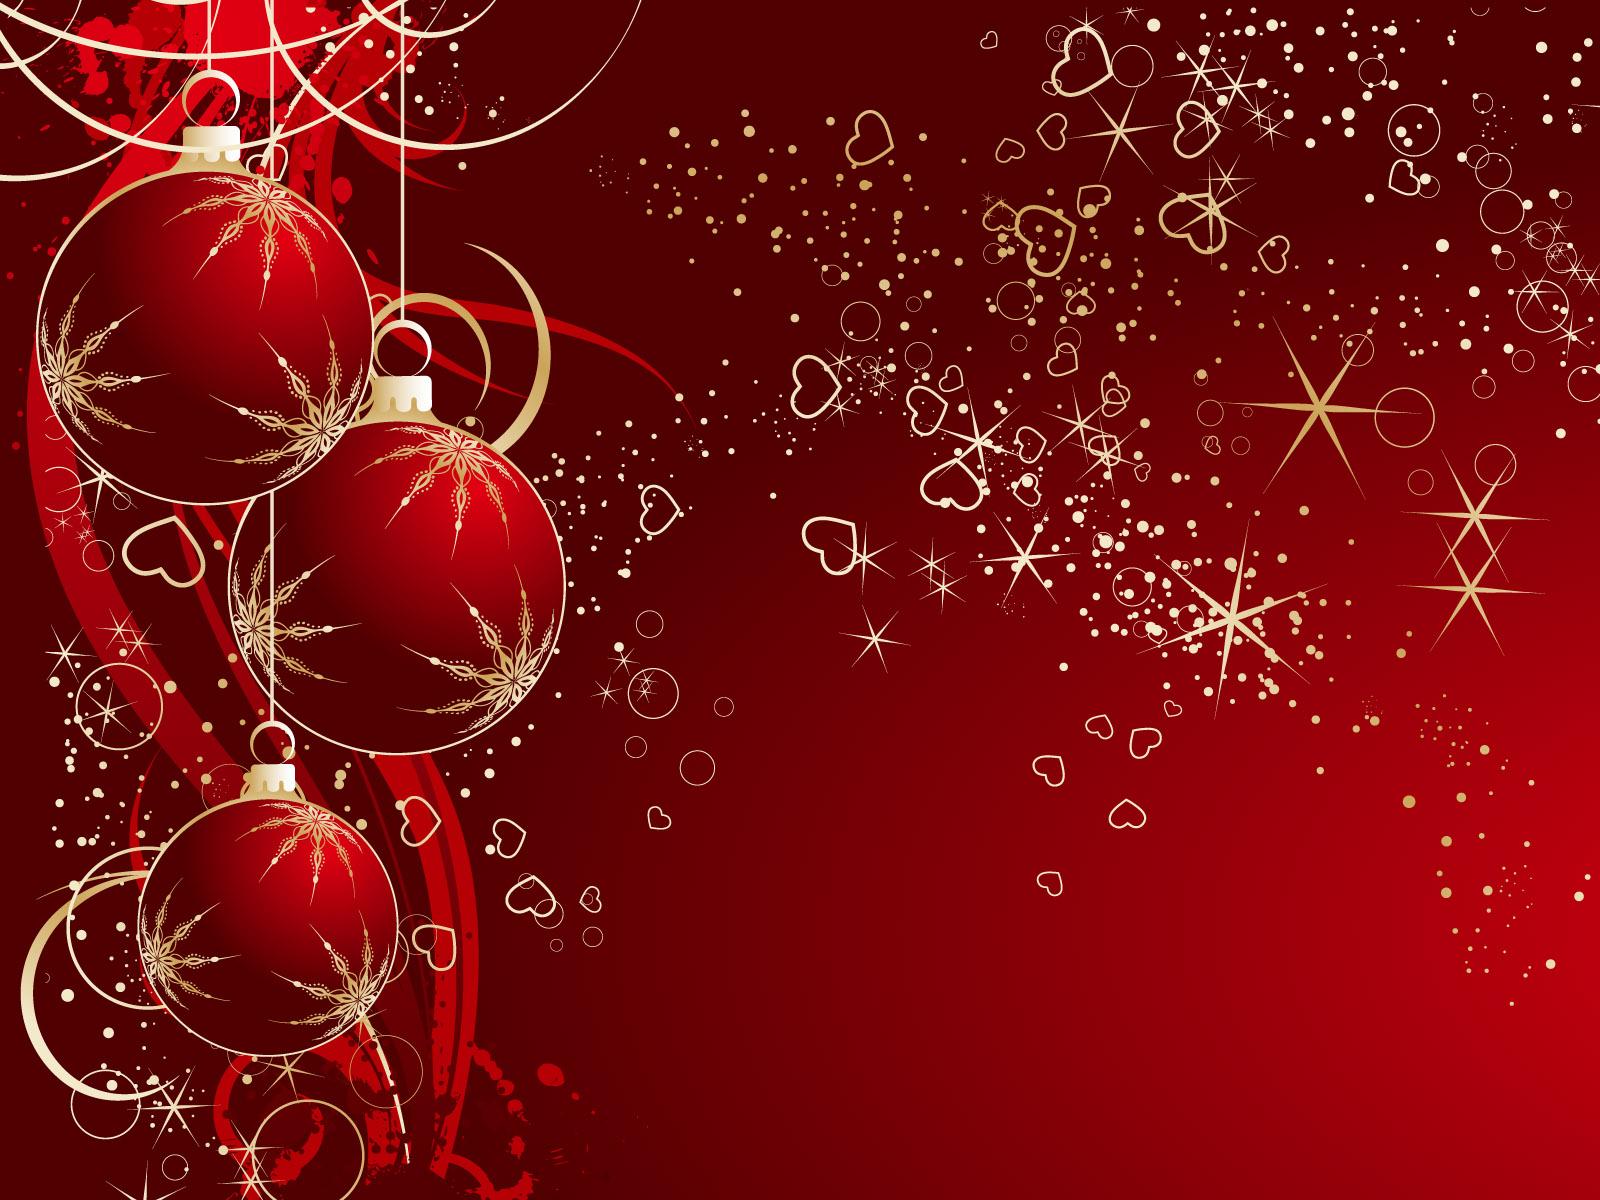 Christmas Backgrounds For Desktop 7026560 1600x1200